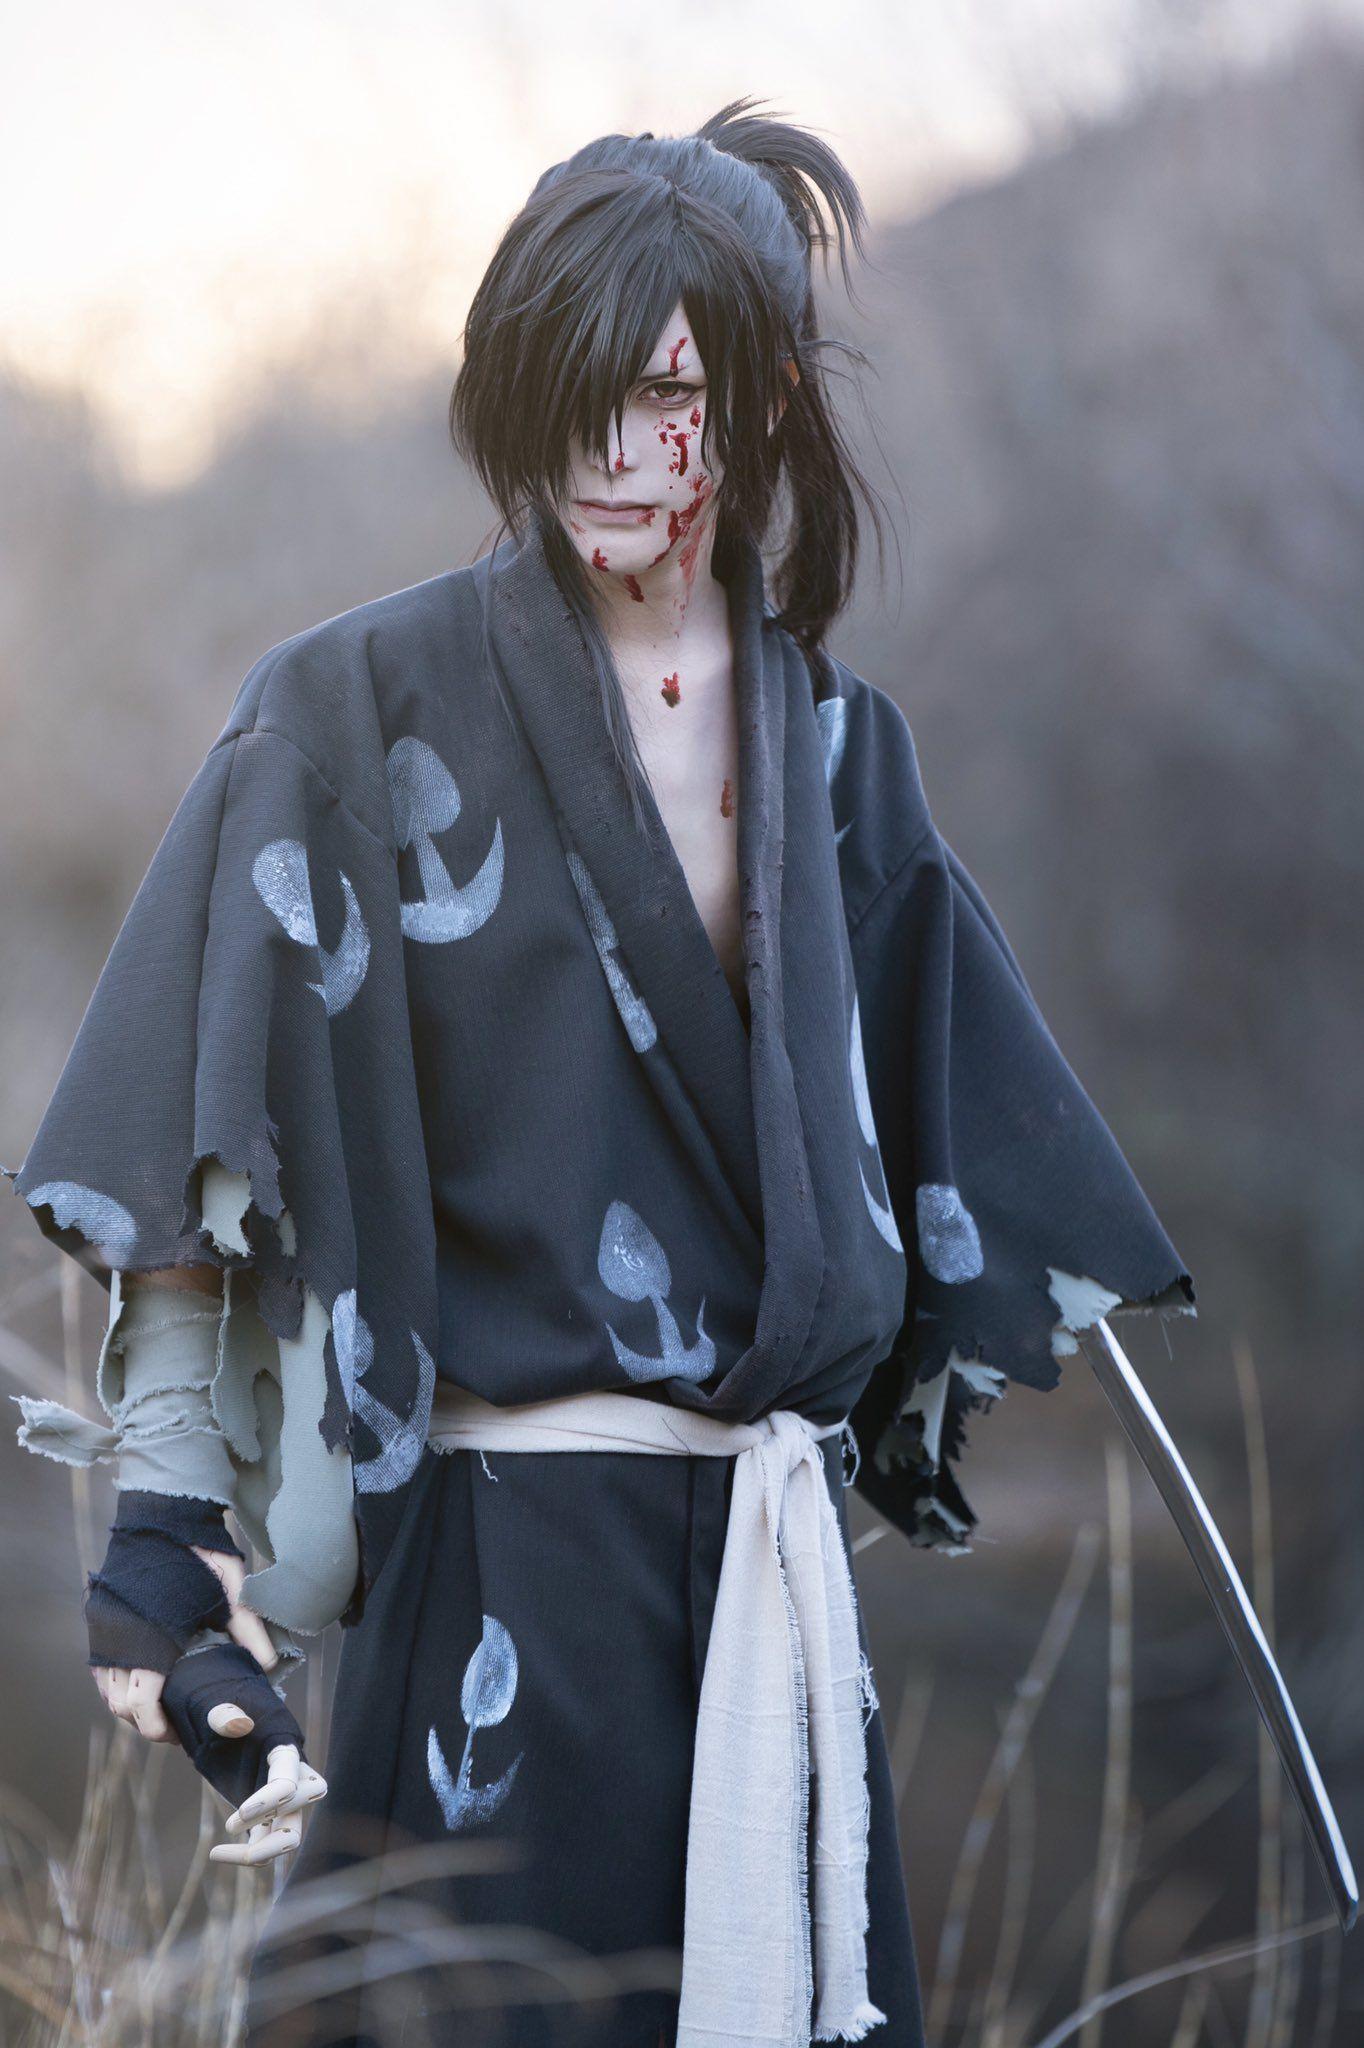 Anime Tokyo Ghoul Haise Sasaki Cos Handmade Cosplay Costume